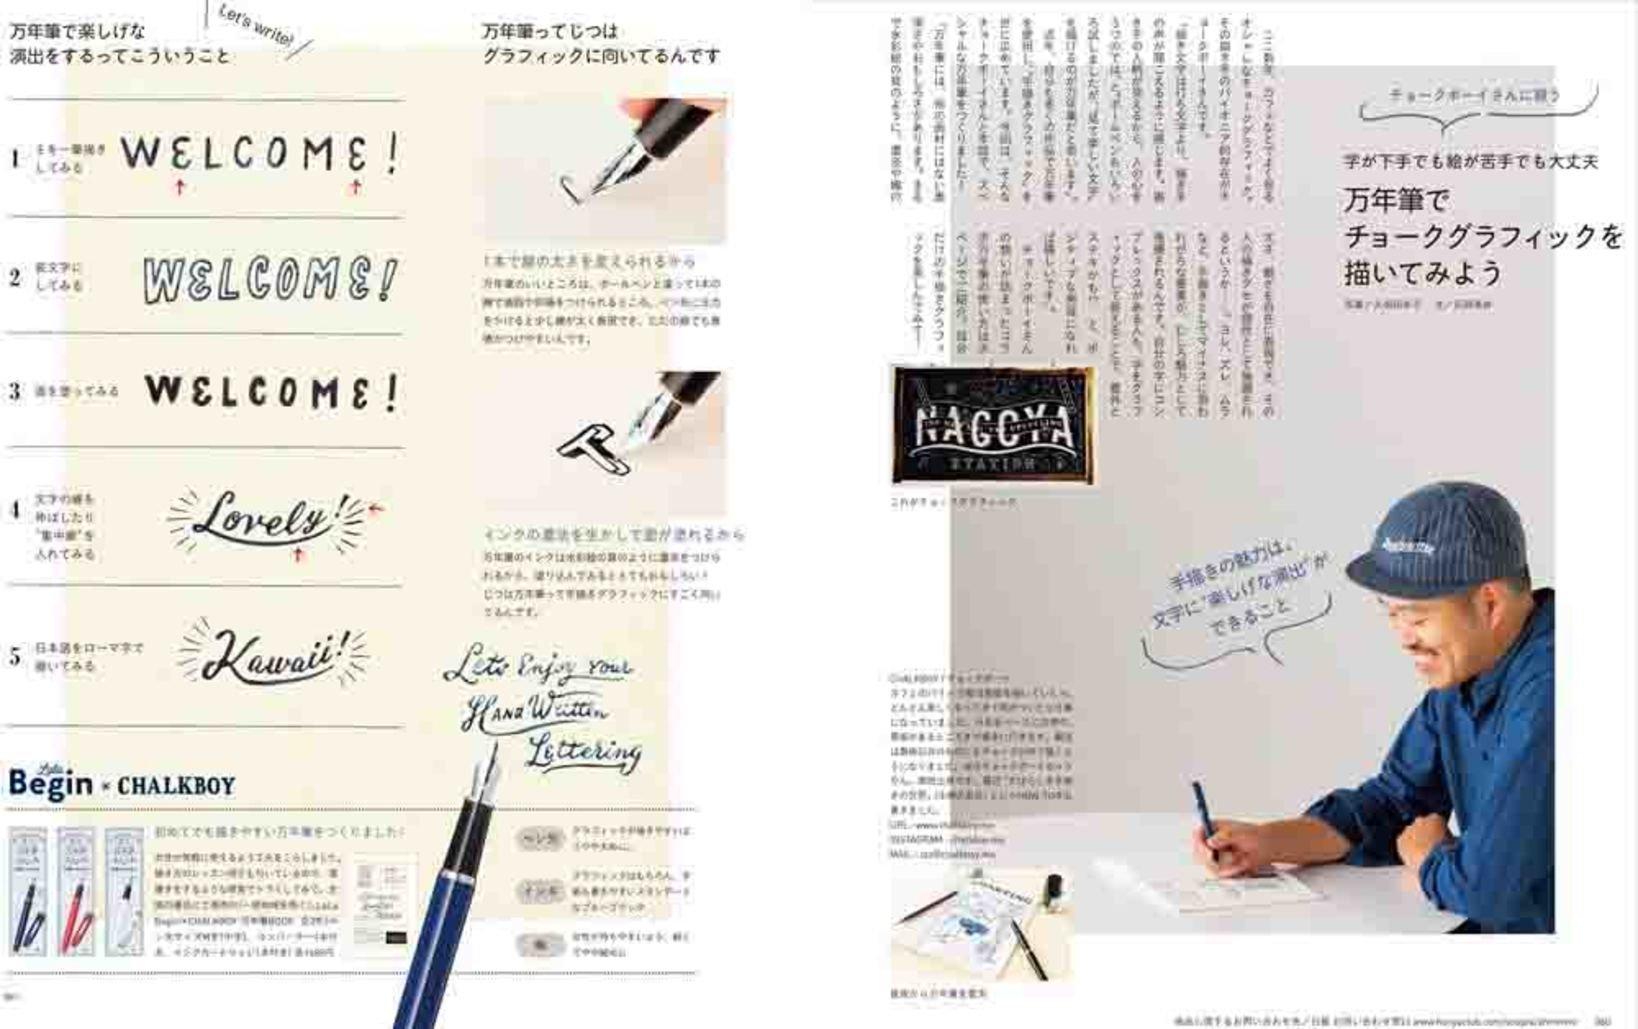 『LaLaBegin 8・9月号』では、チョークボーイさんが万年筆の魅力を紹介